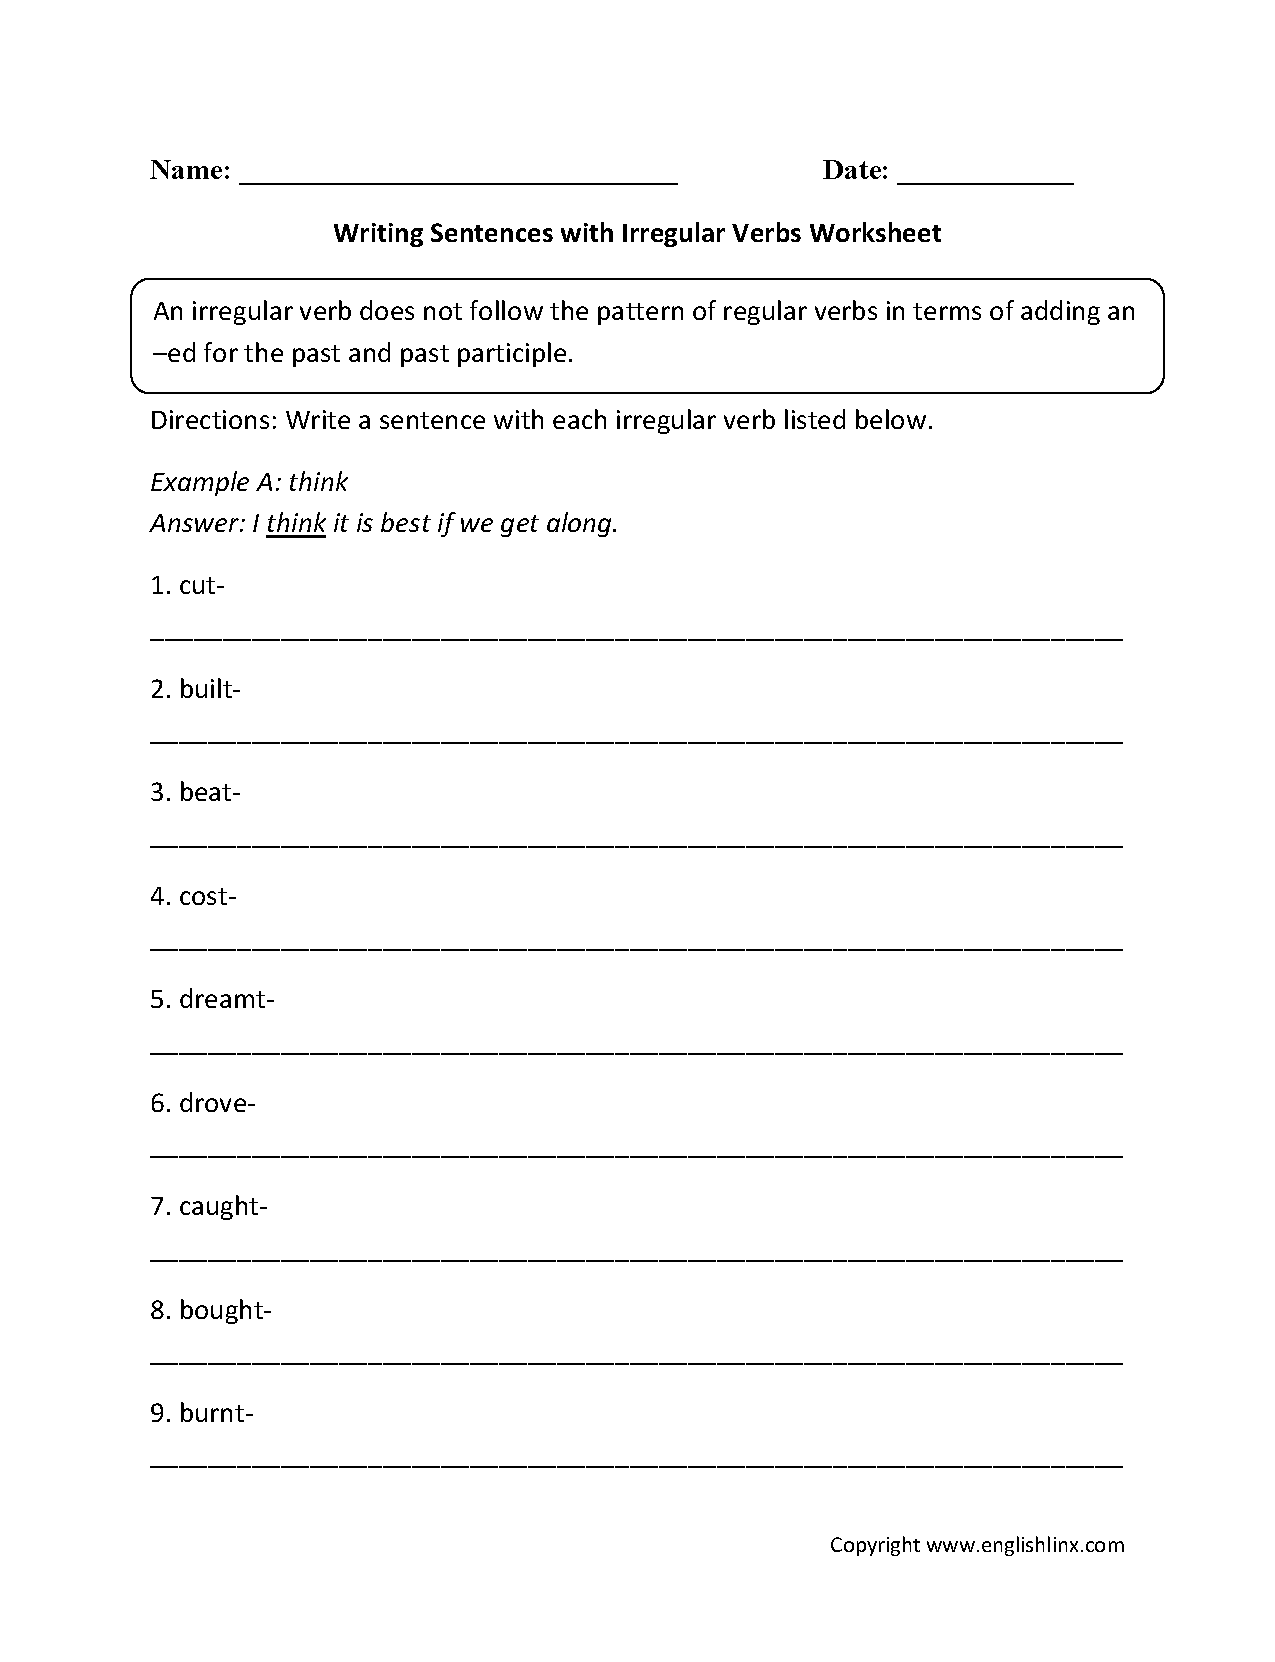 Writing Sentences With Irregular Verbs Worksheets